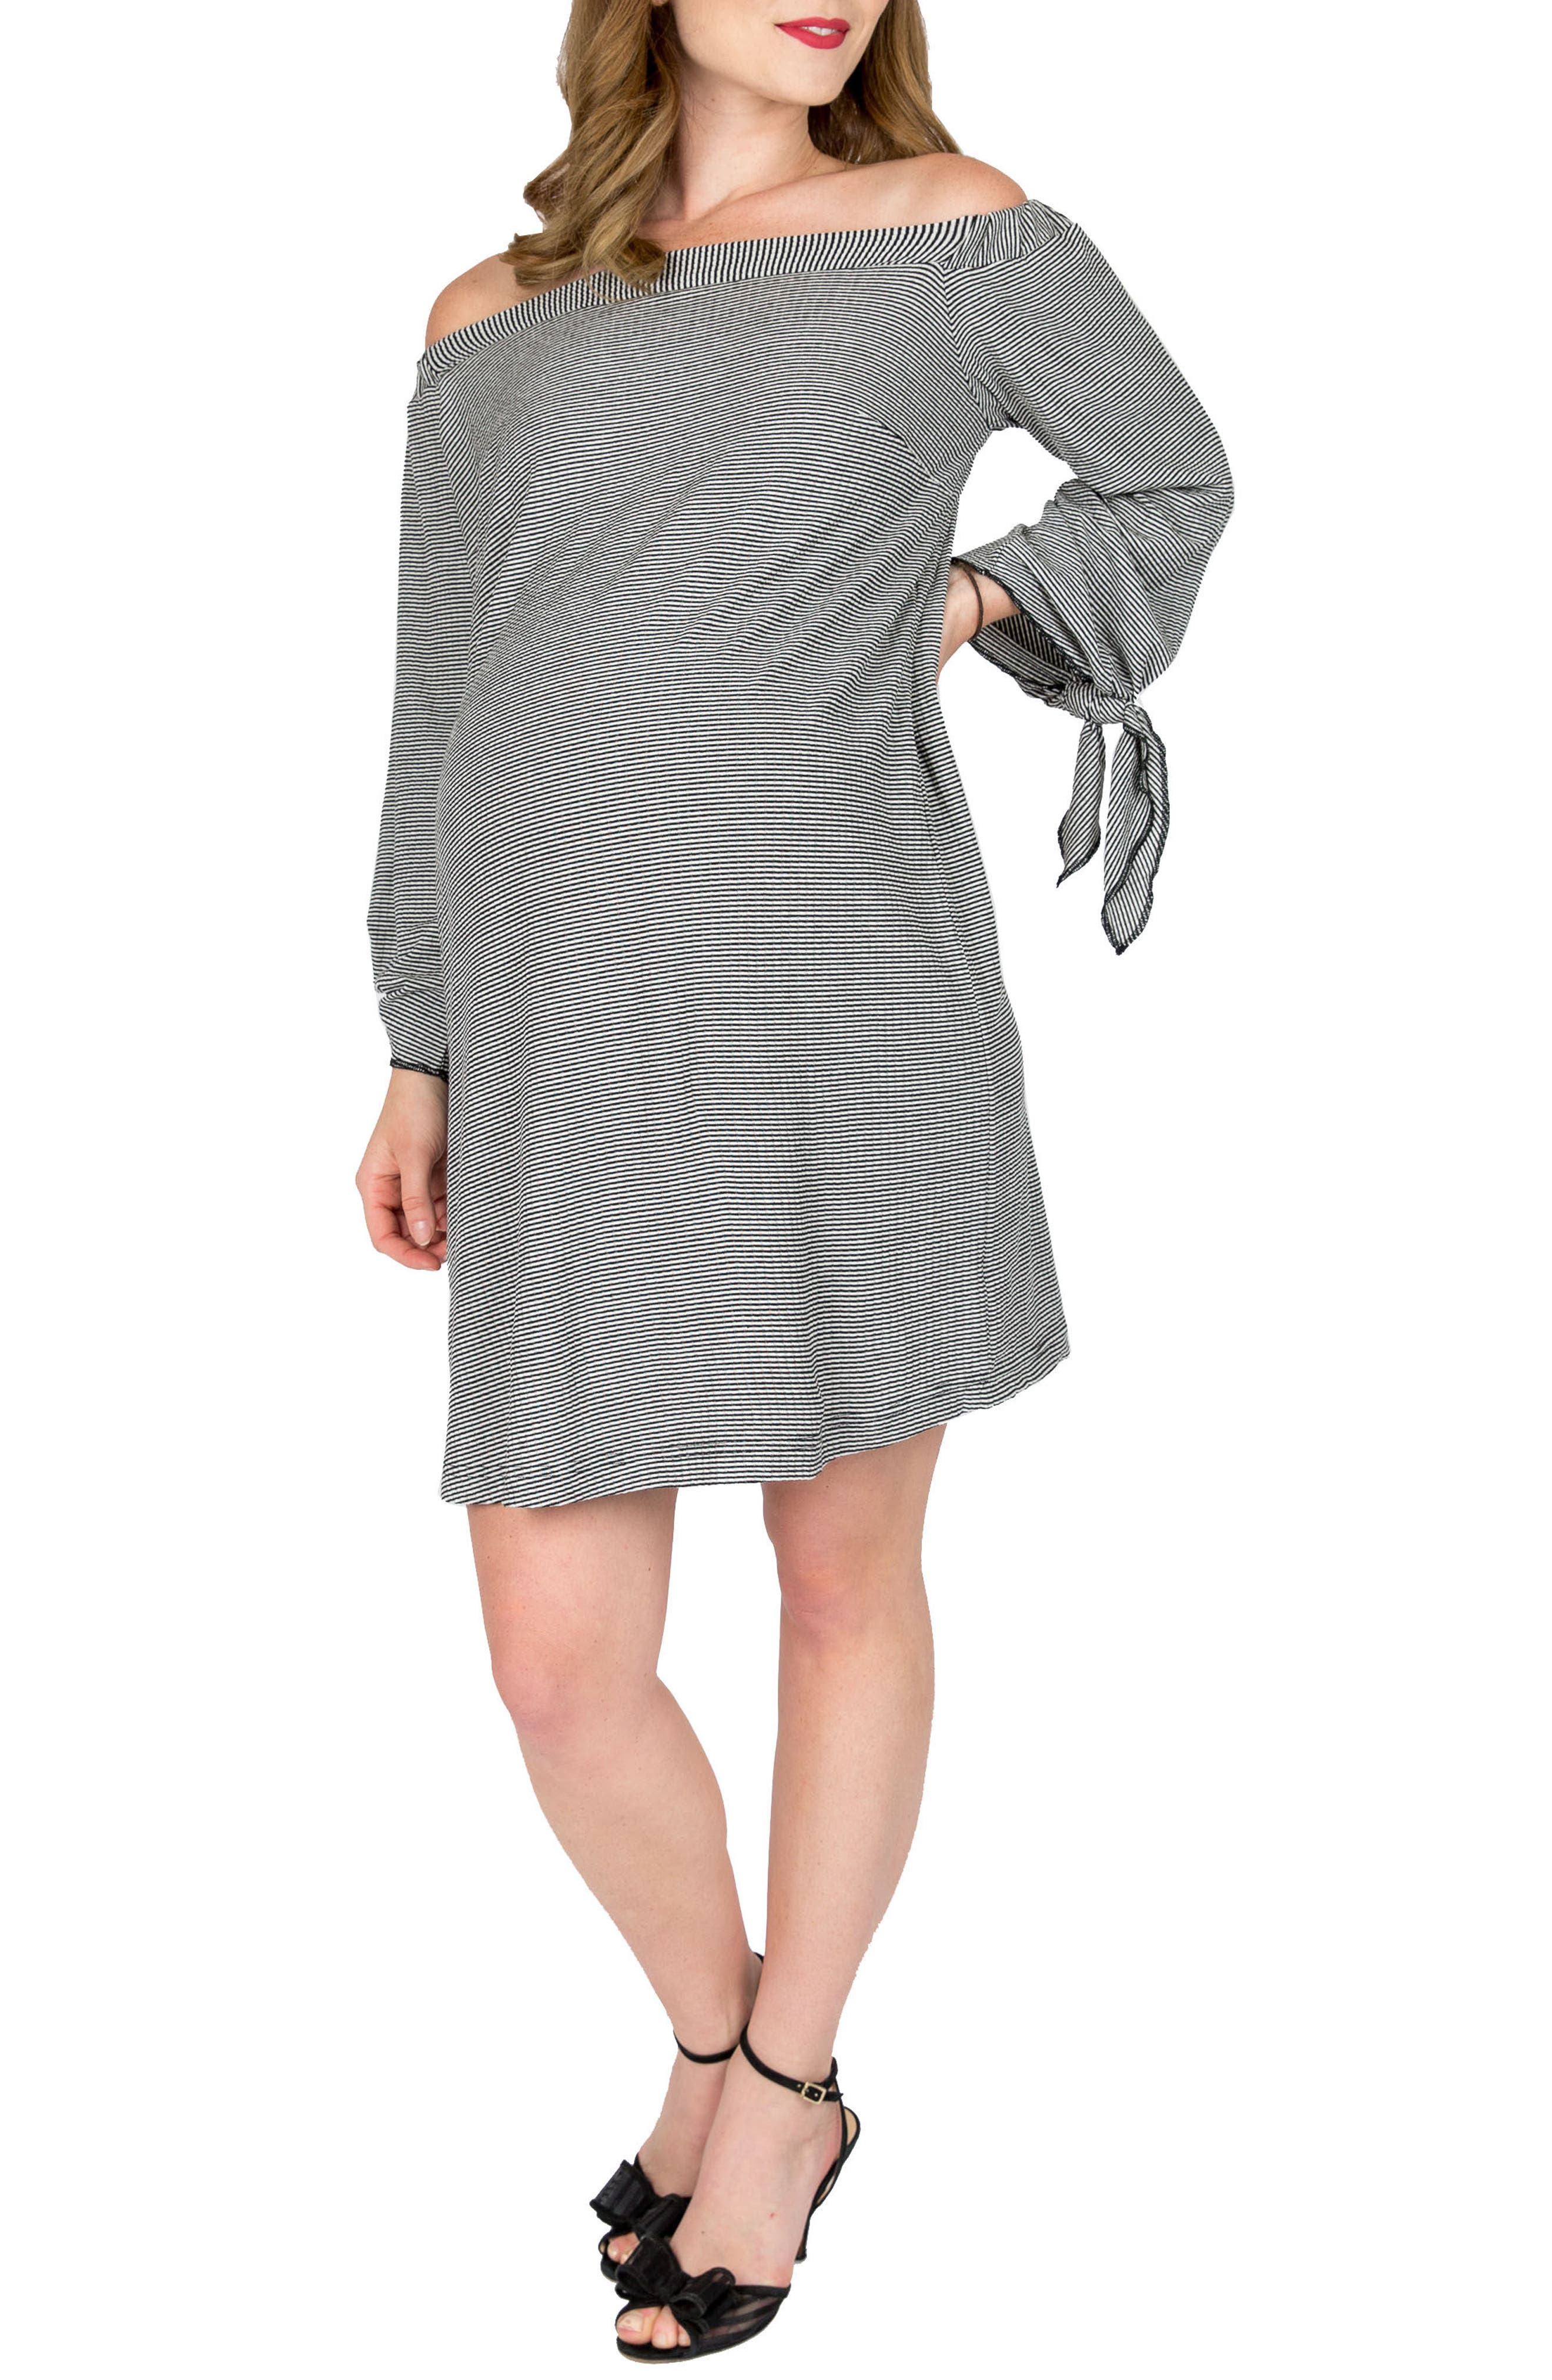 Octavia Off The Shoulder Maternity Dress,                         Main,                         color, Black White Stripe